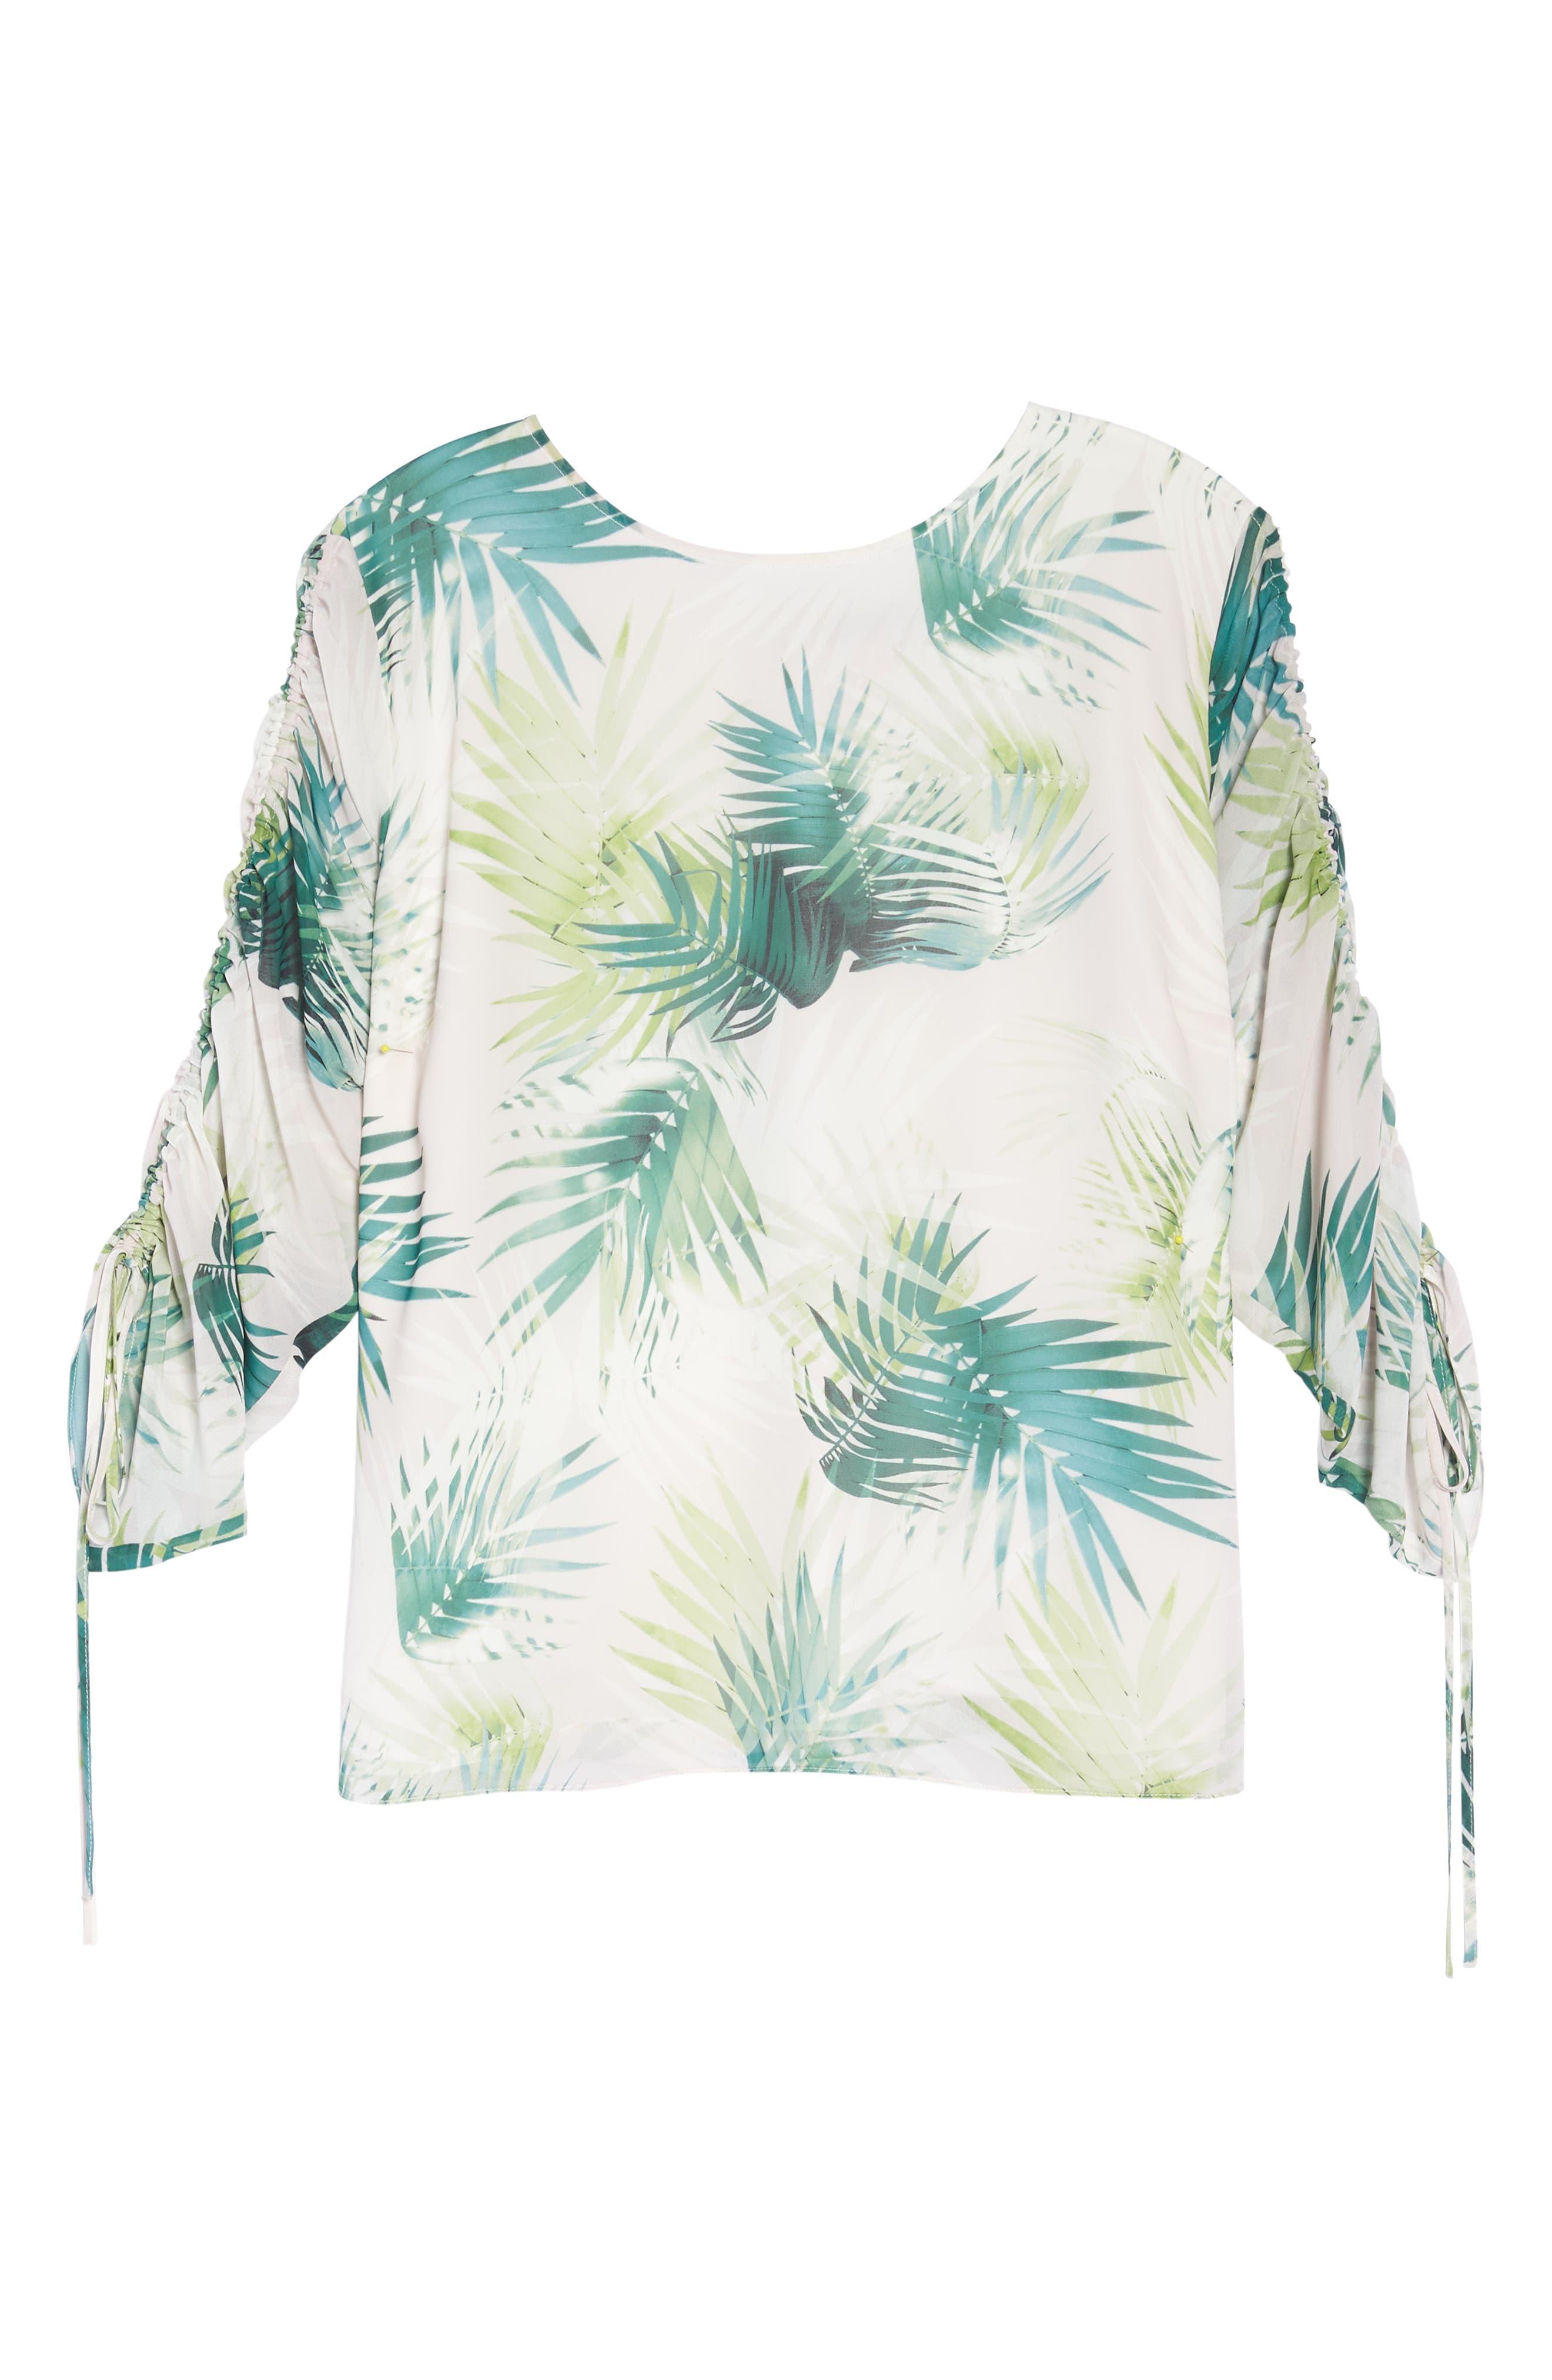 Drawstring Sleeve Sunlit Palm Print Top,                             Alternate thumbnail 7, color,                             Verdant Green